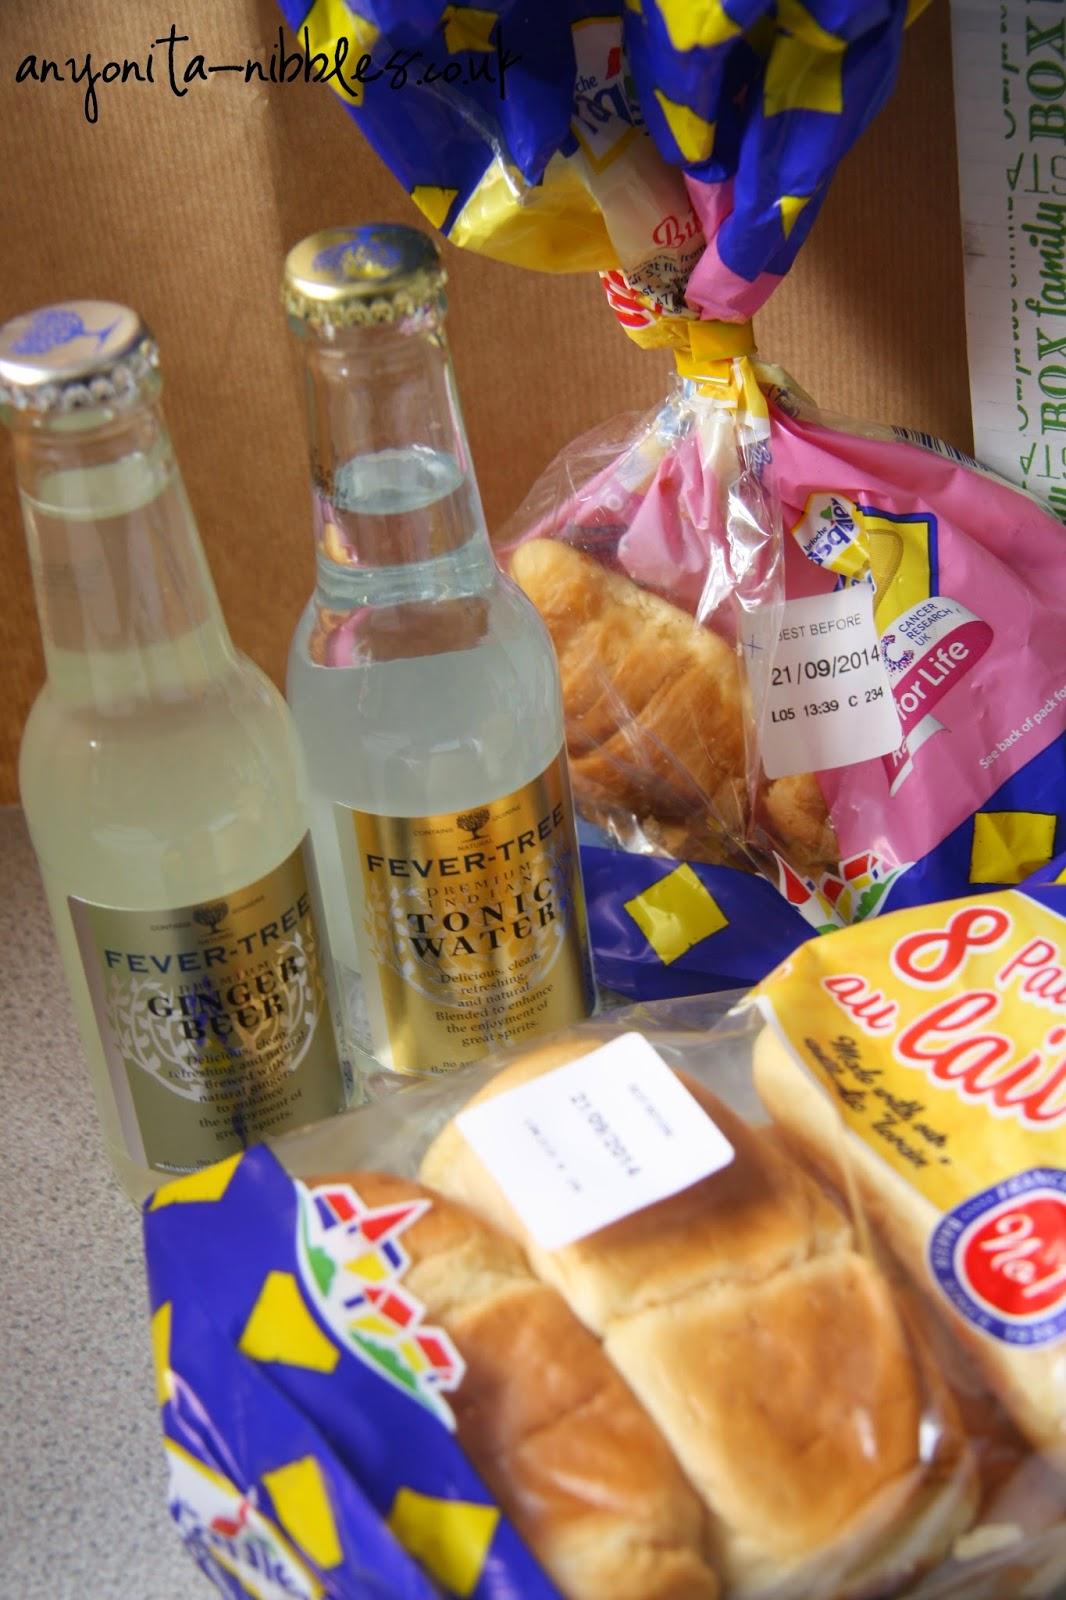 Degustabox may not be food allergy friendly | anyonita-nibbles.co.uk